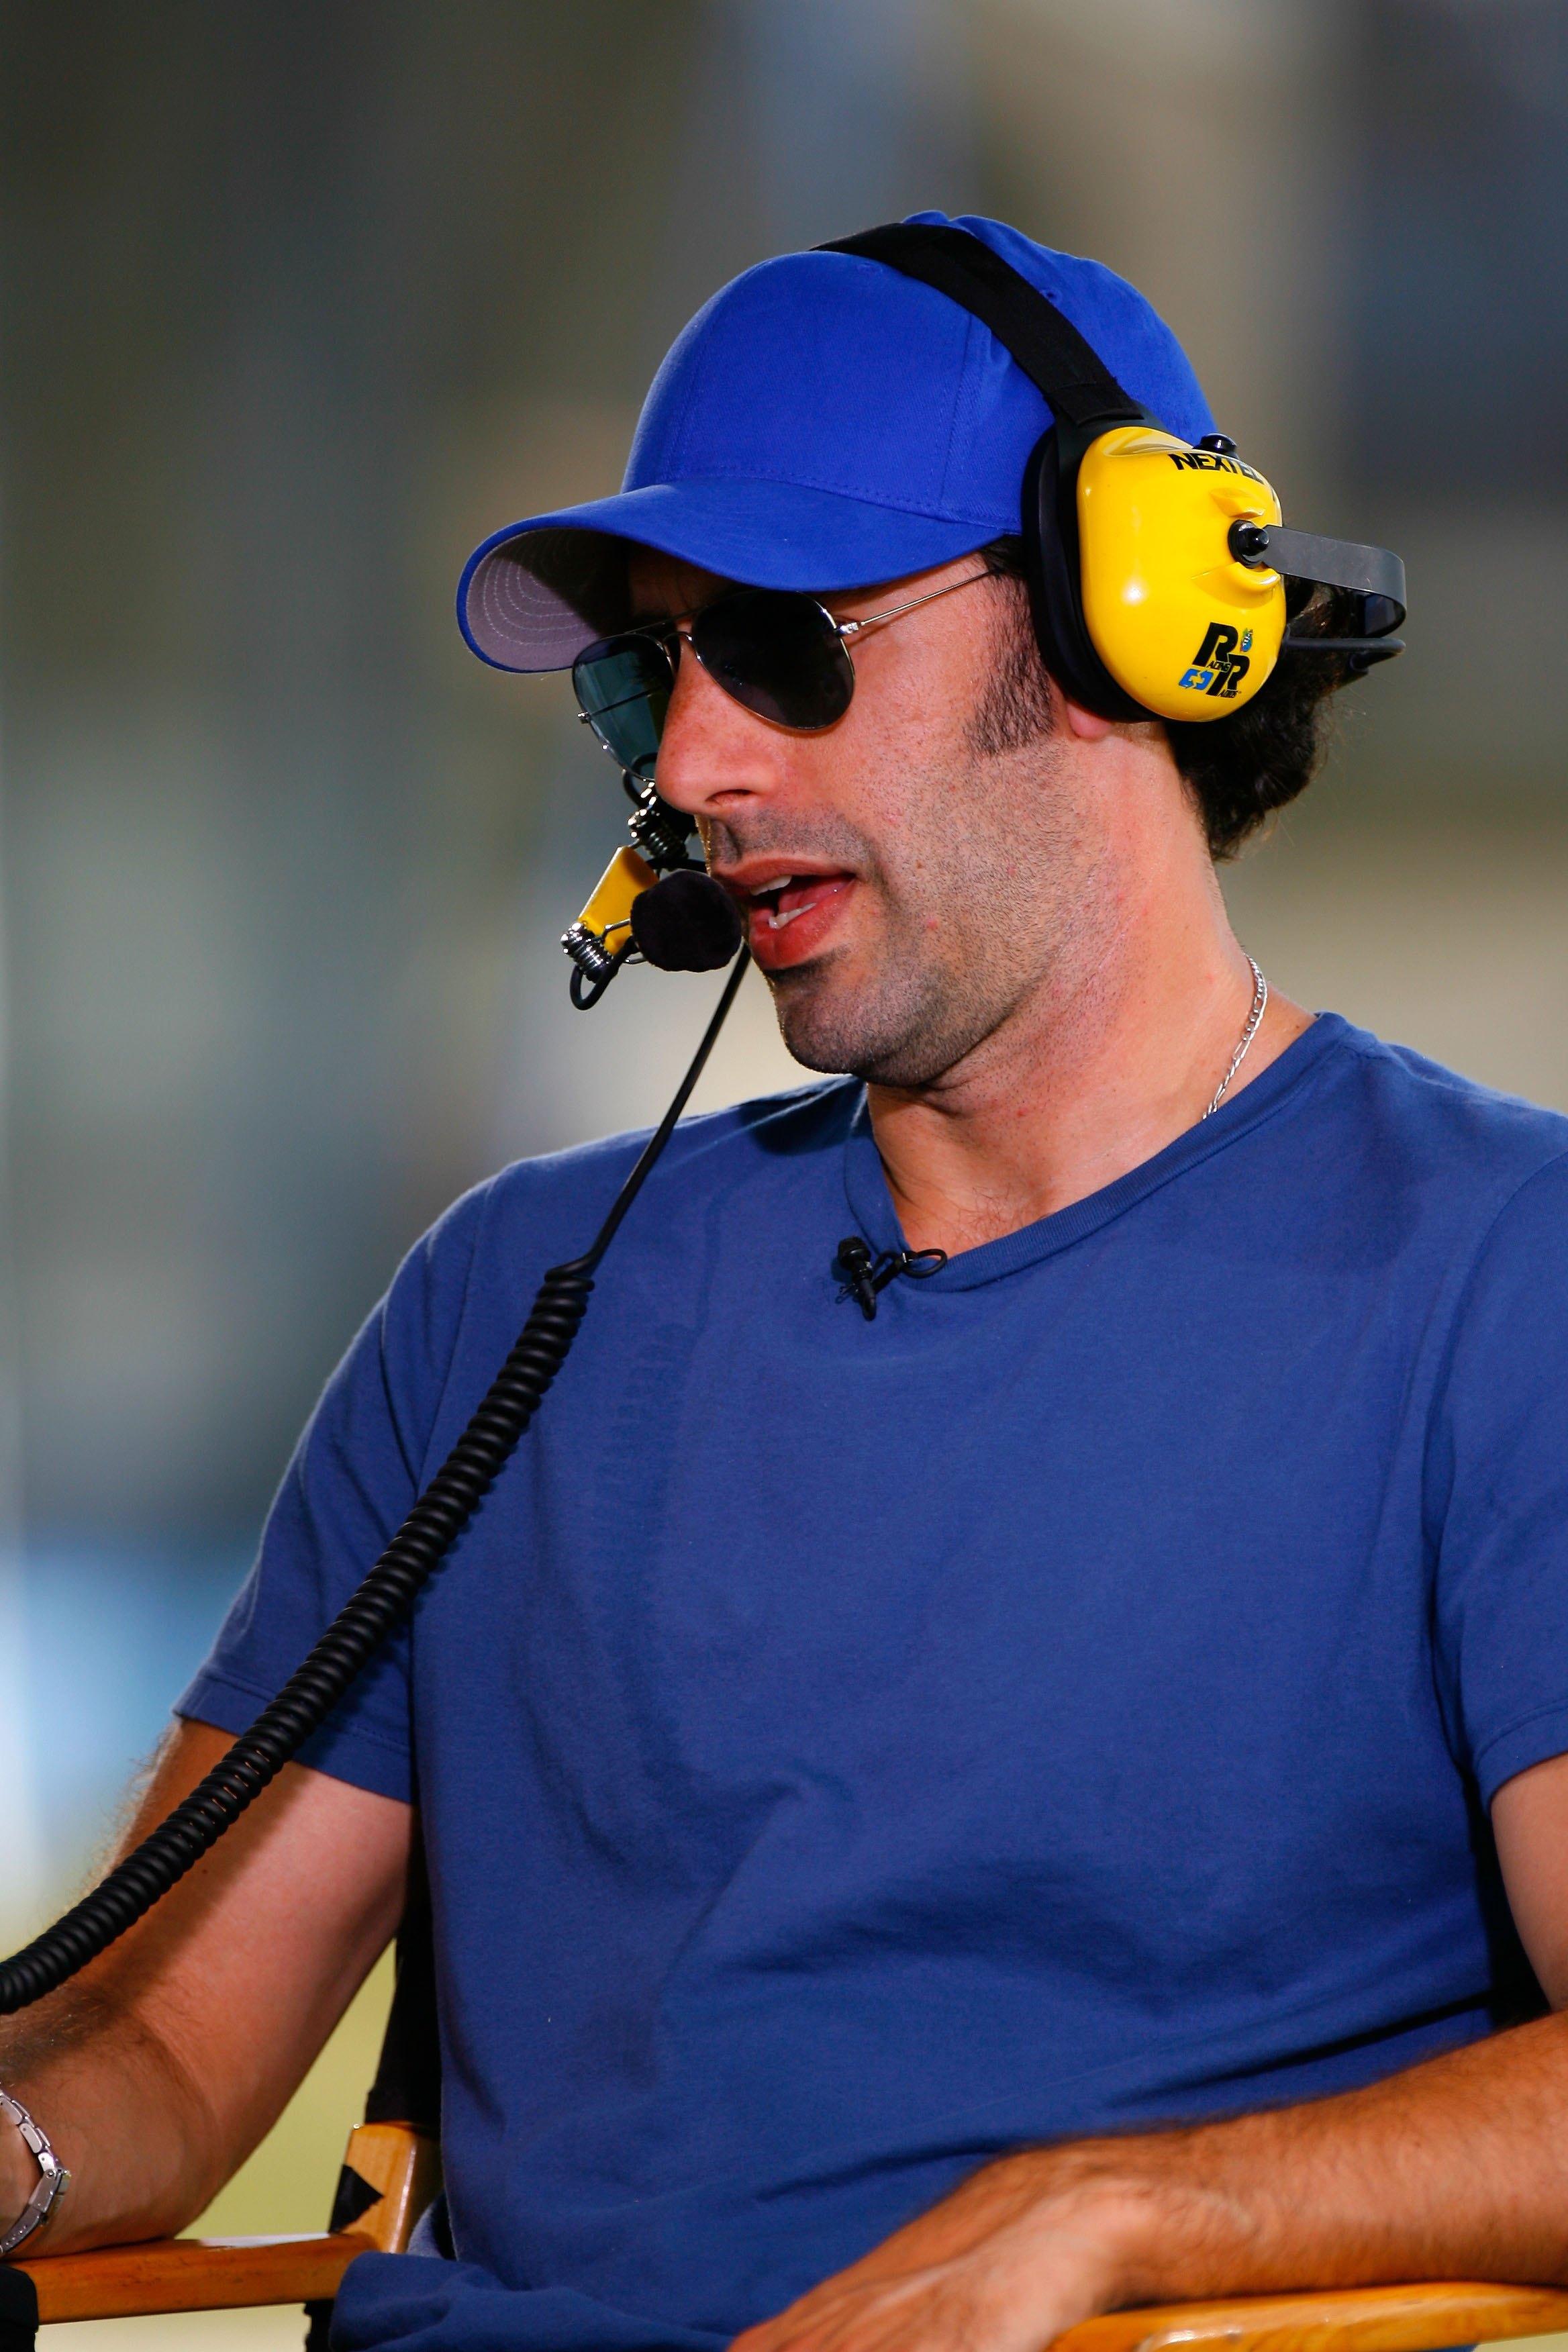 Sasha Baron Cohen played a French NASCAR driver in the movie Talladega Nights.